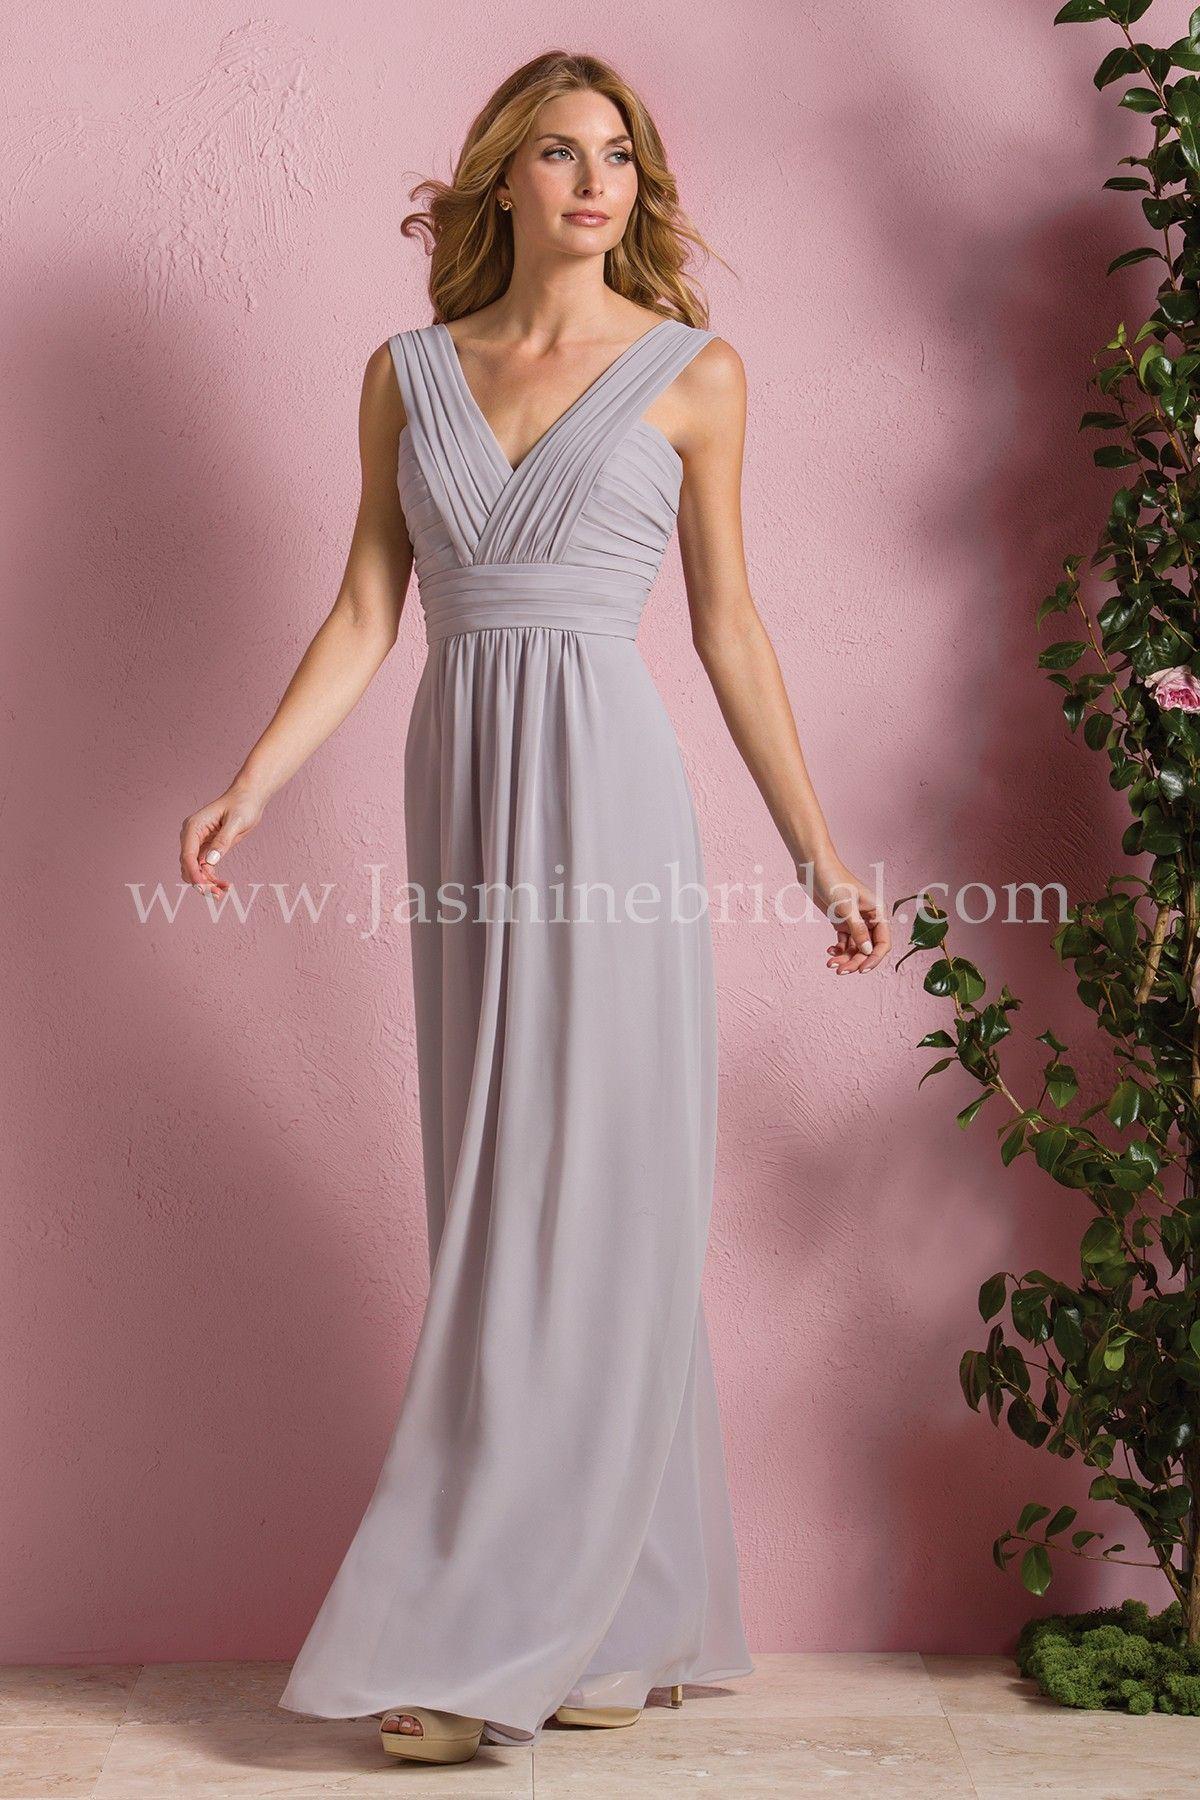 Jasmine Bridal Bridesmaid Dress B2 Style B173054 In Graphite A Simple That Can Make Splash At Any Wedding